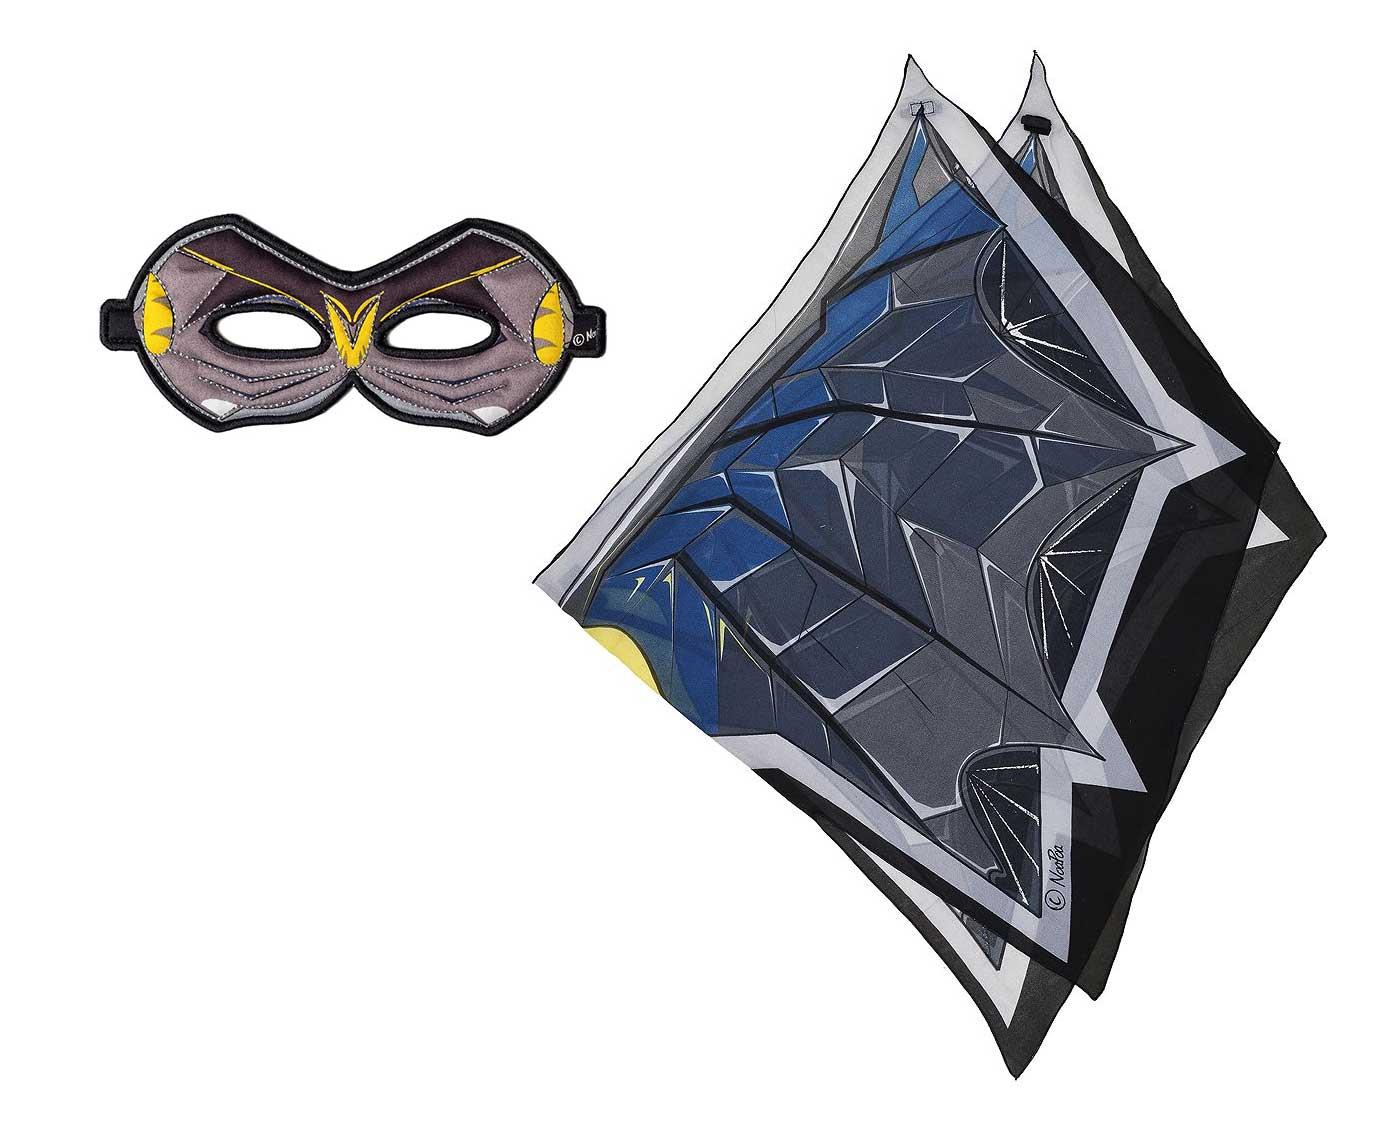 Vleugel set 'Bat'